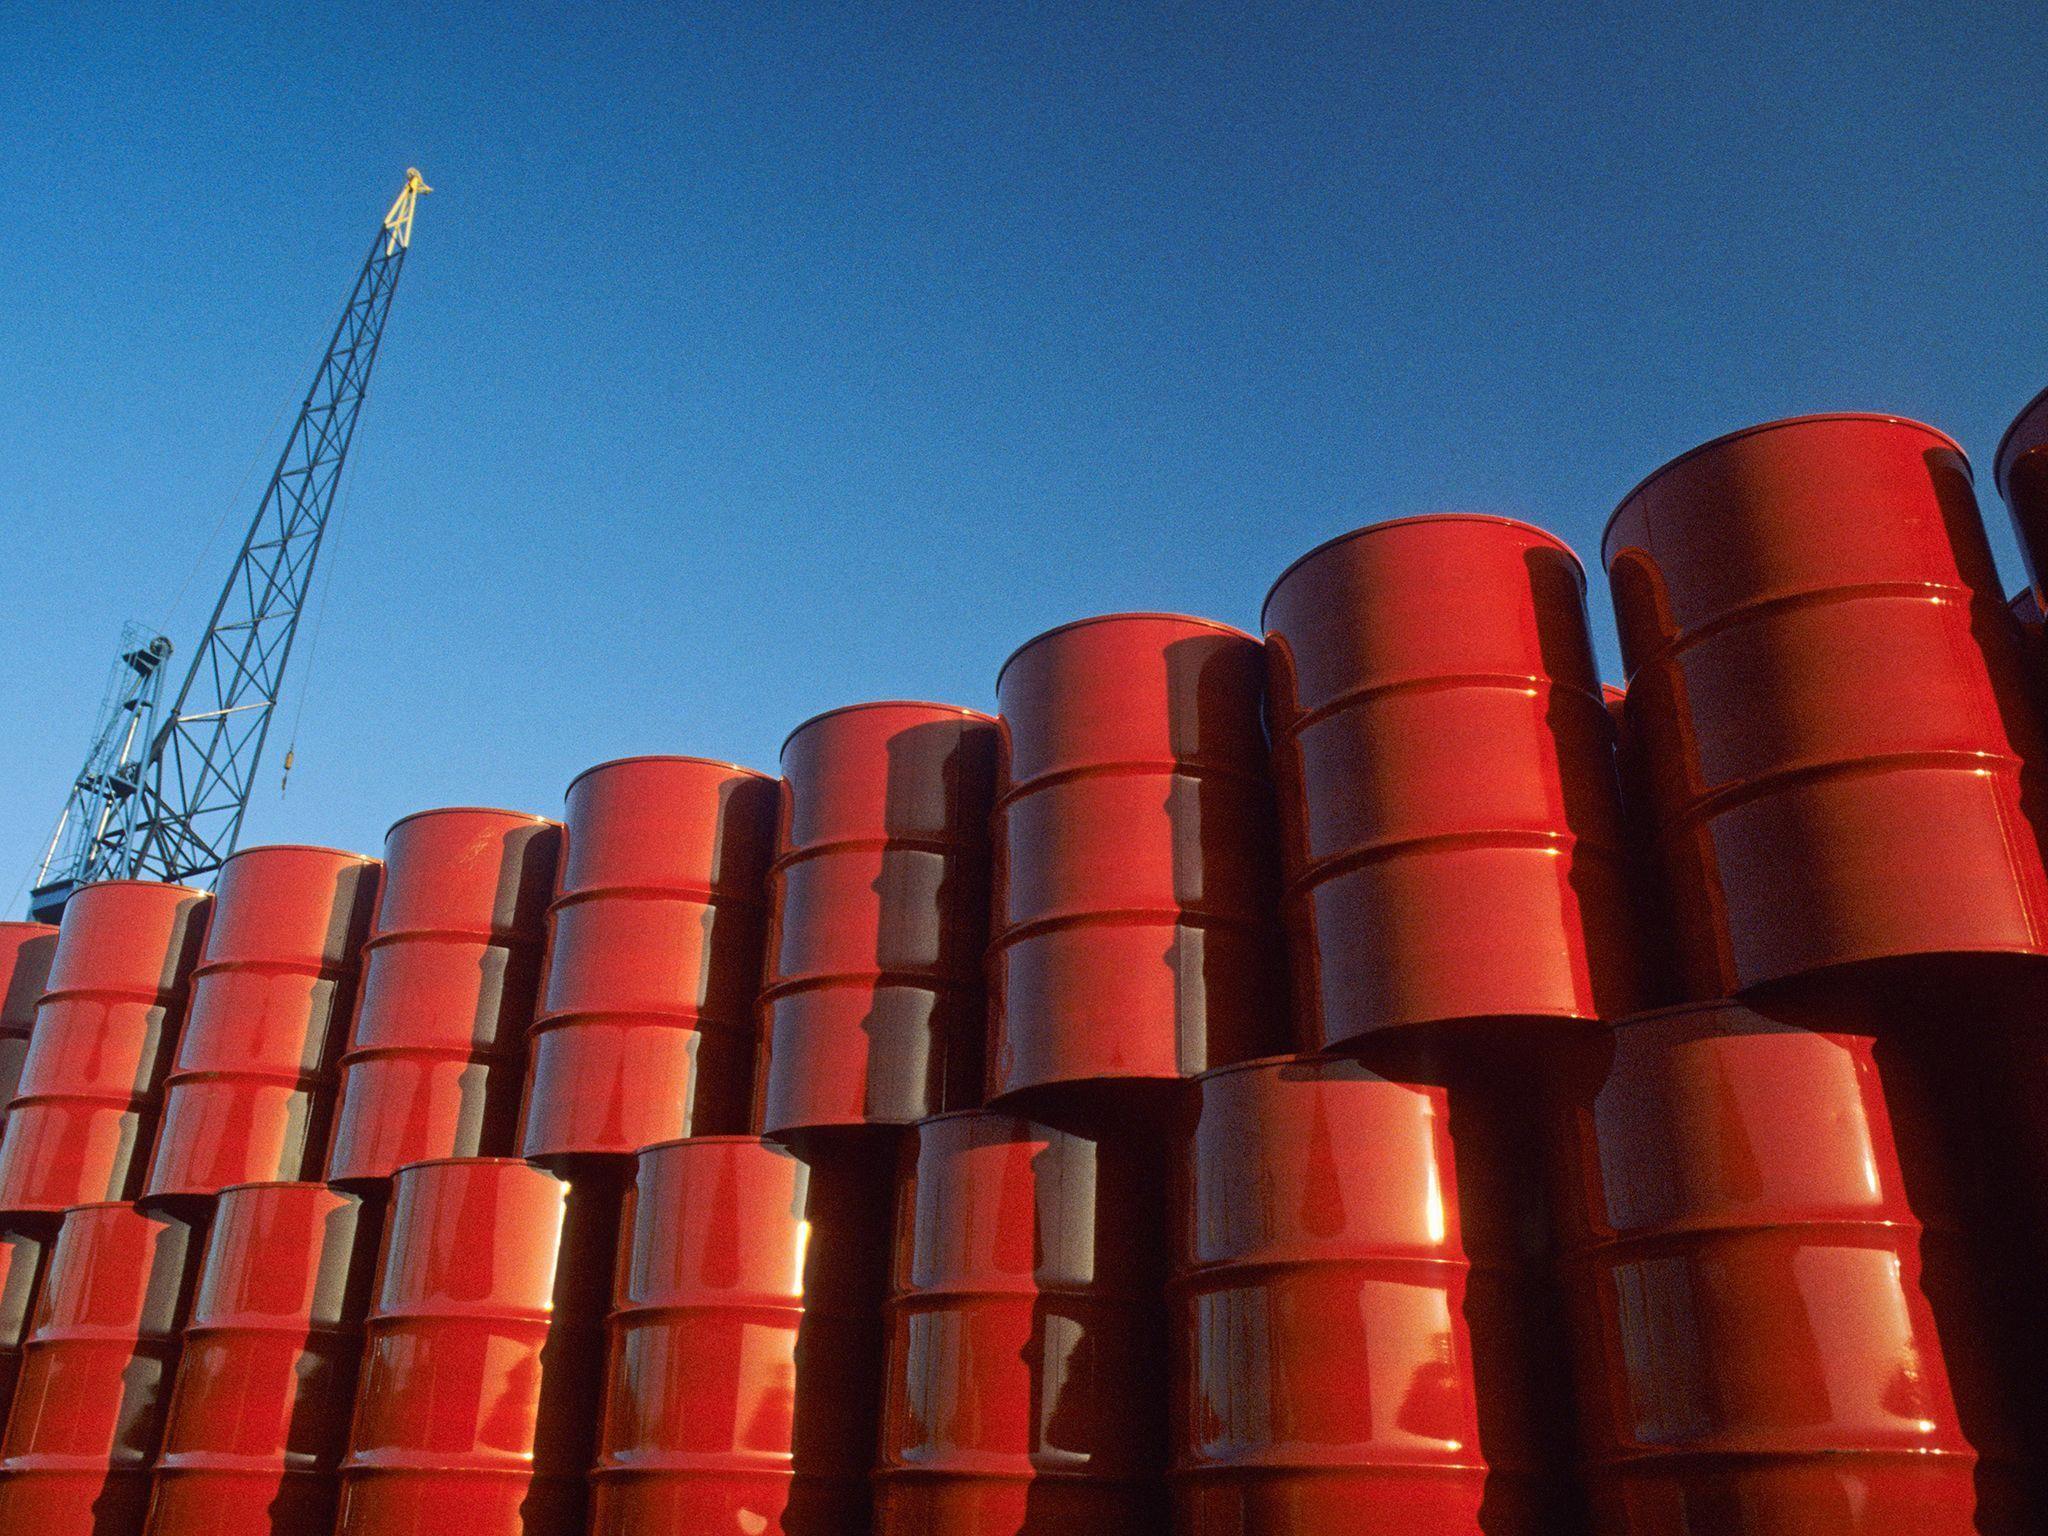 A Barrel Now Costs More Than A Barrel Of Oil Barrel Crude Oil Oil And Gas